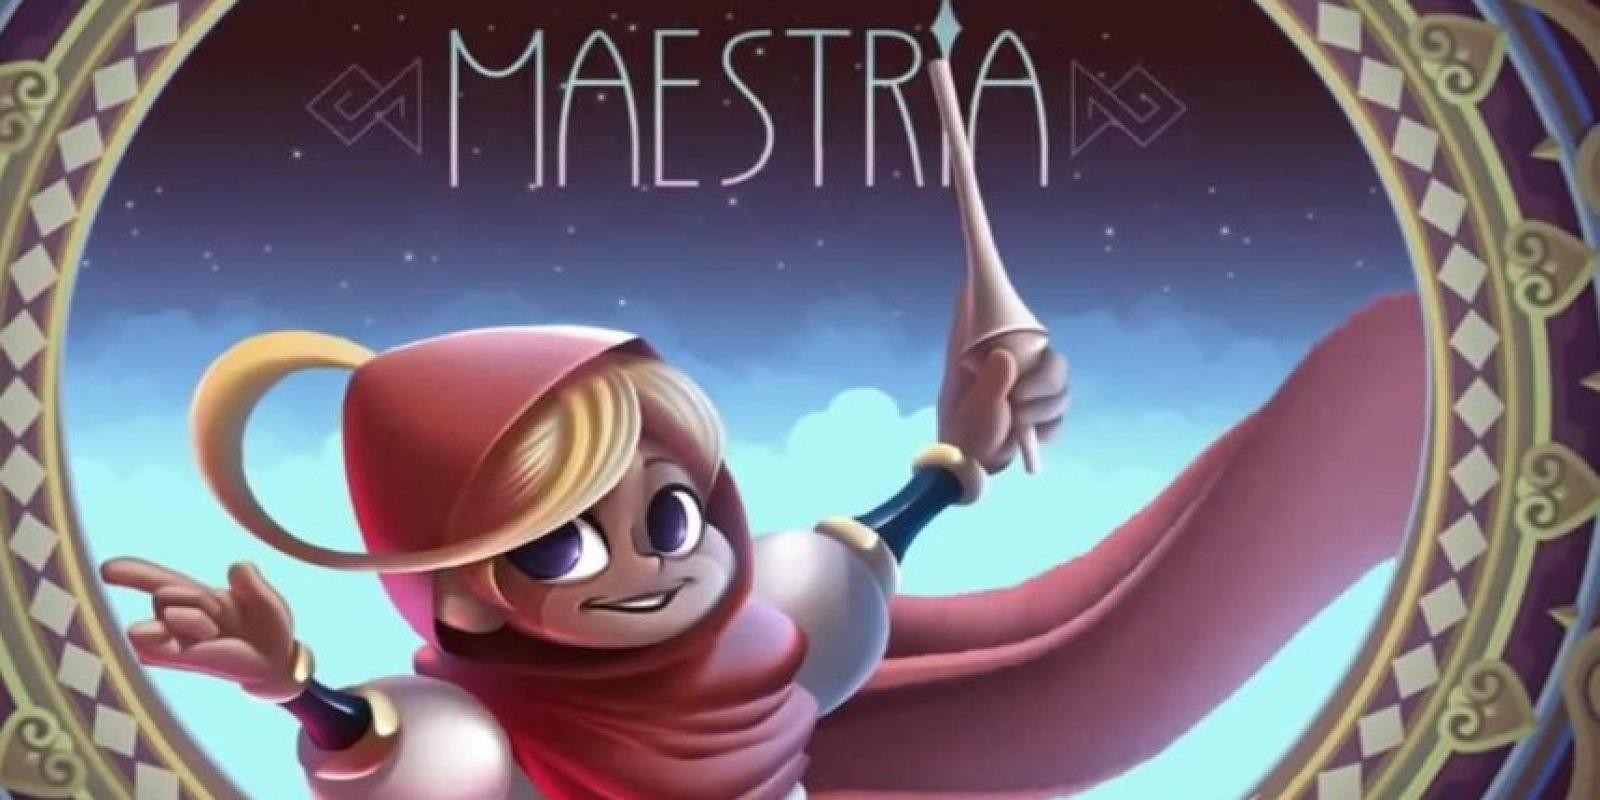 """Maestria"" fue creado por Antoine Latour. Foto:Maestria"